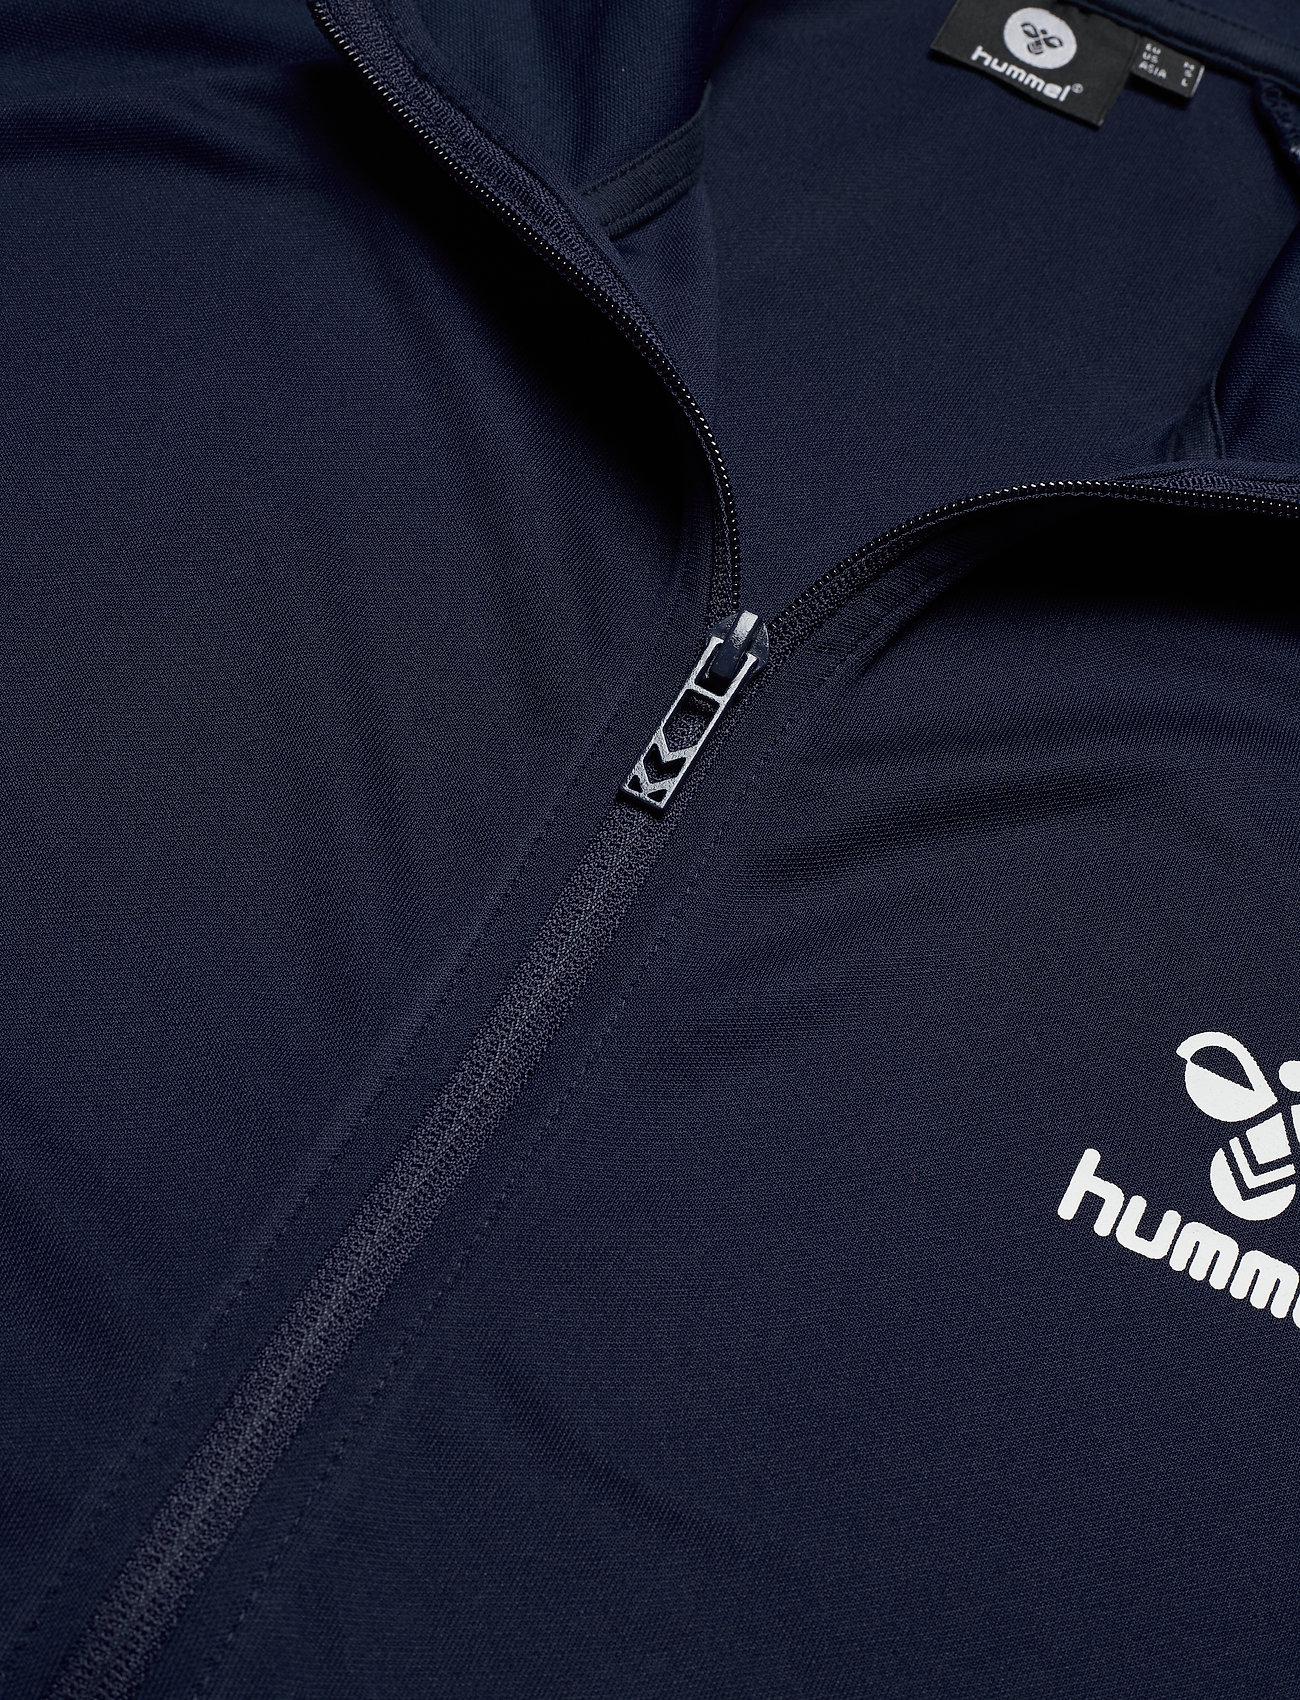 Hummel hmlARNE ZIP JACKET - Sweatshirts BLACK IRIS - Menn Klær